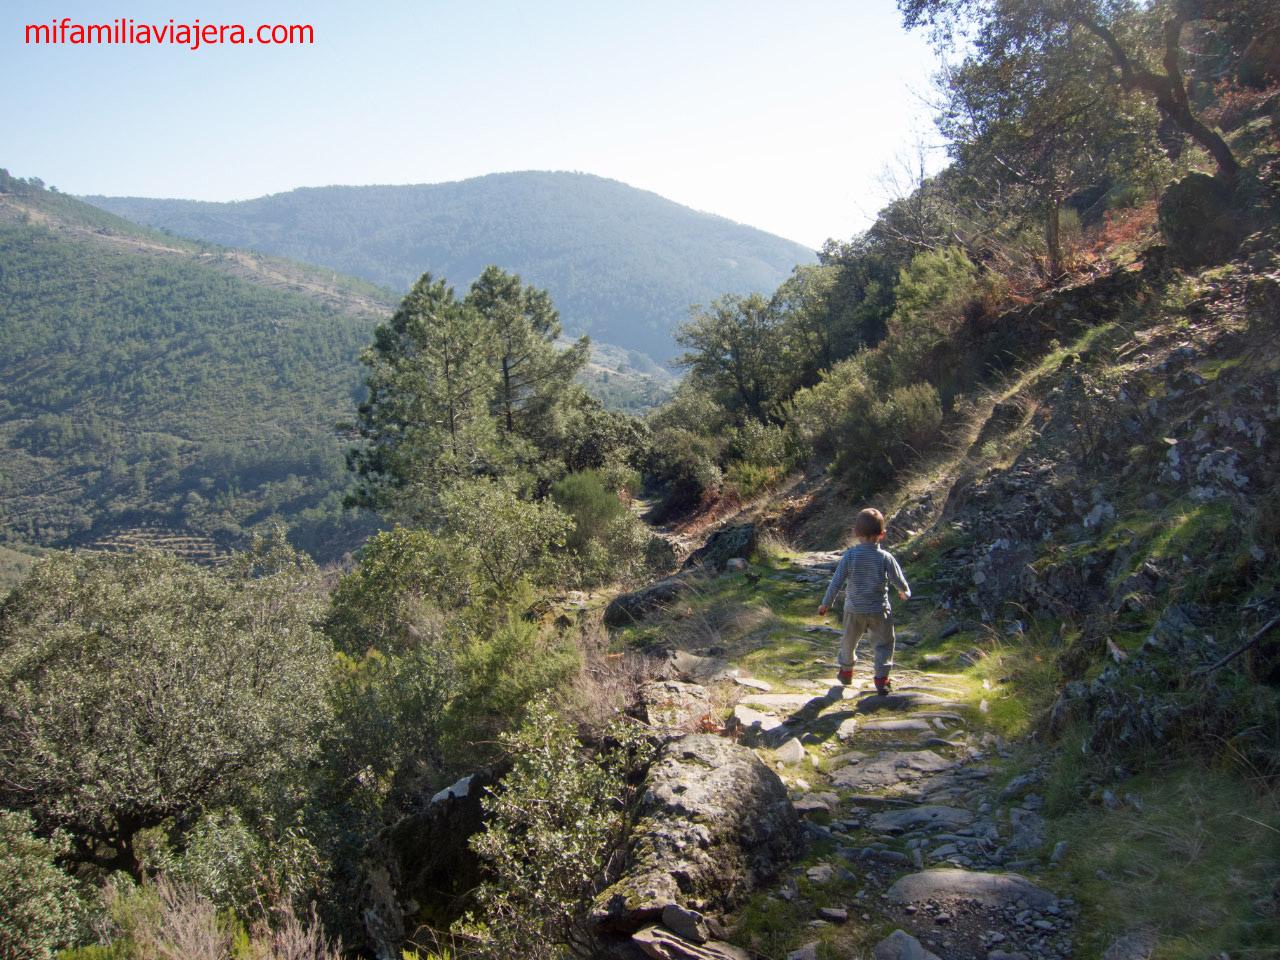 Senda Chorrituelo de Ovejuela por el camino de Robledillo, Las Hurdes